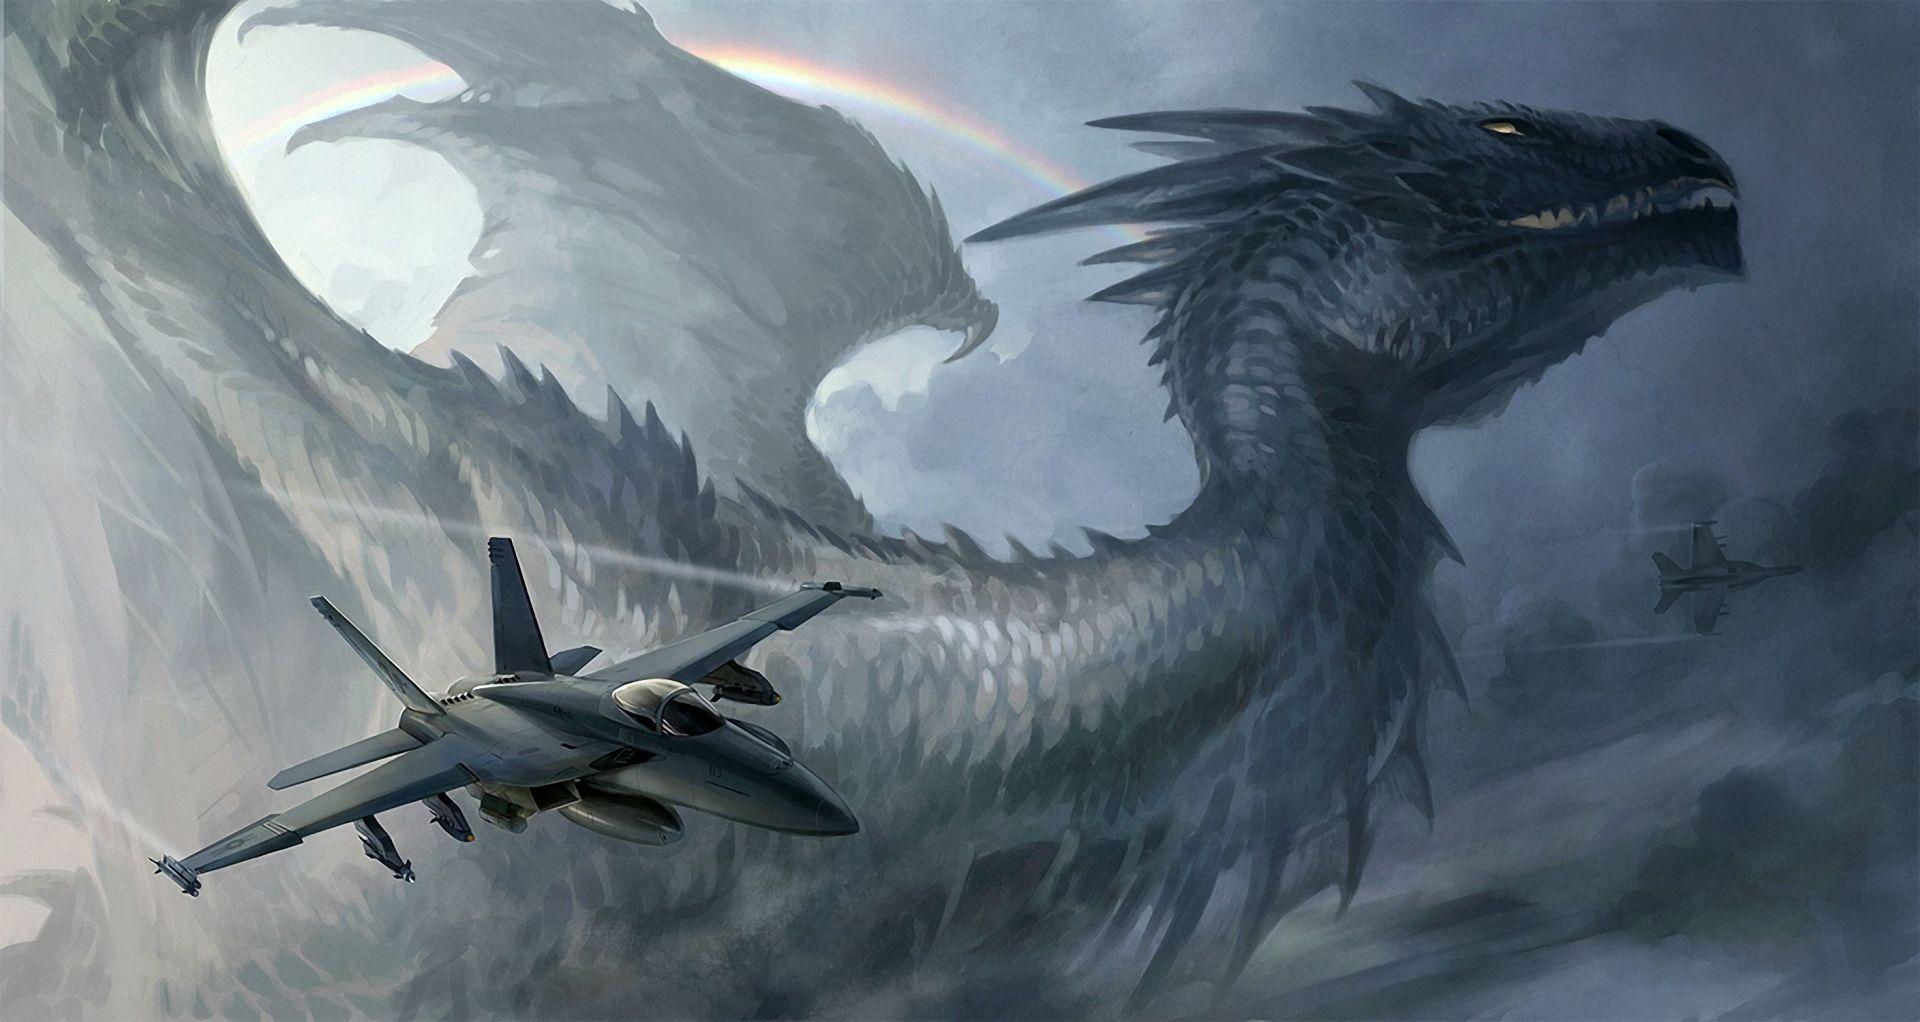 dragon hd image download